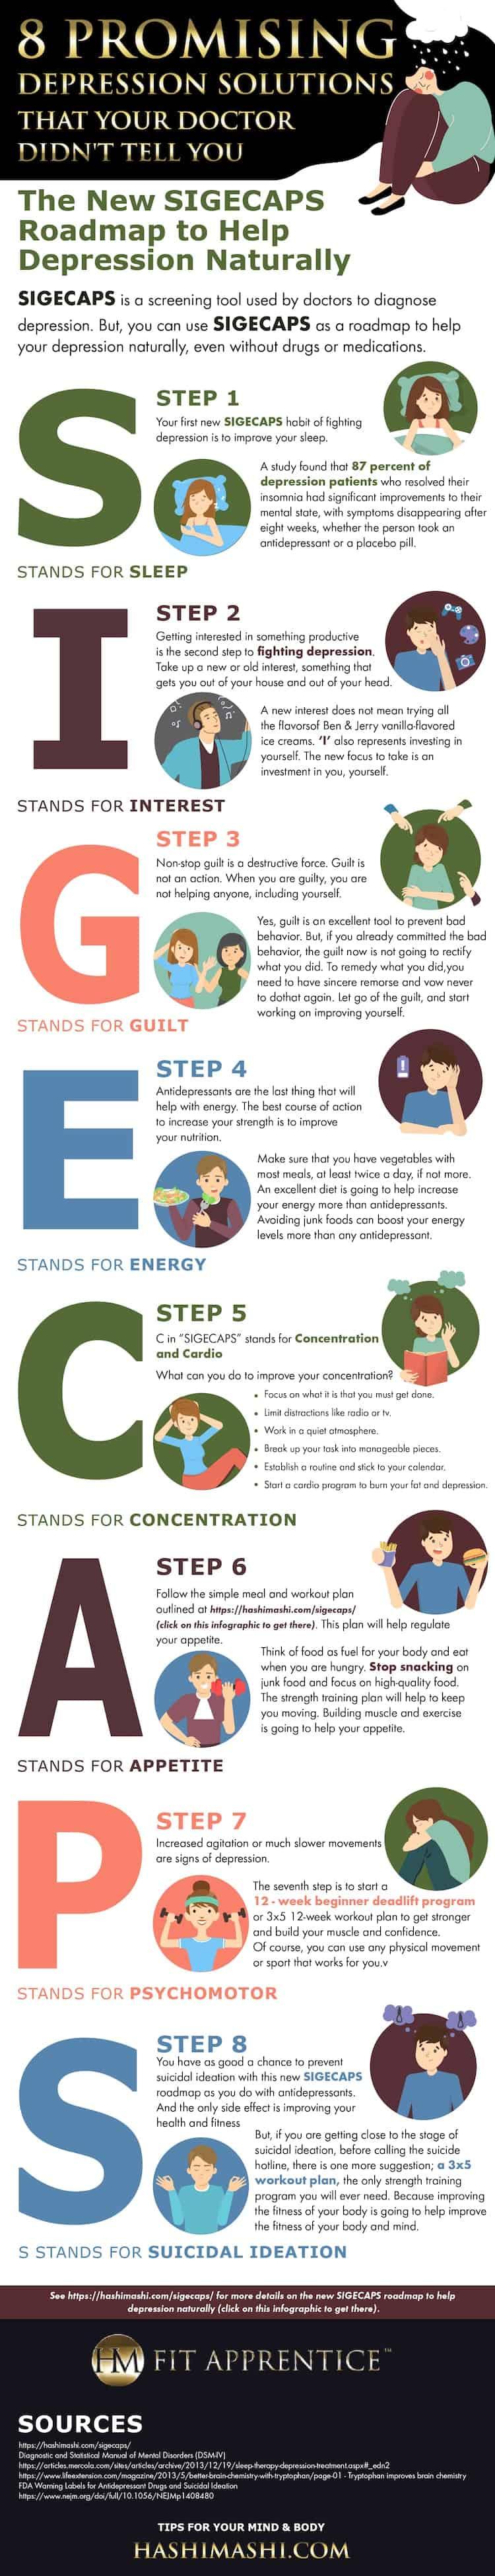 SIGECAPS Infographic How to Help Depression Naturally Image Credit - HashiMashi.com-min